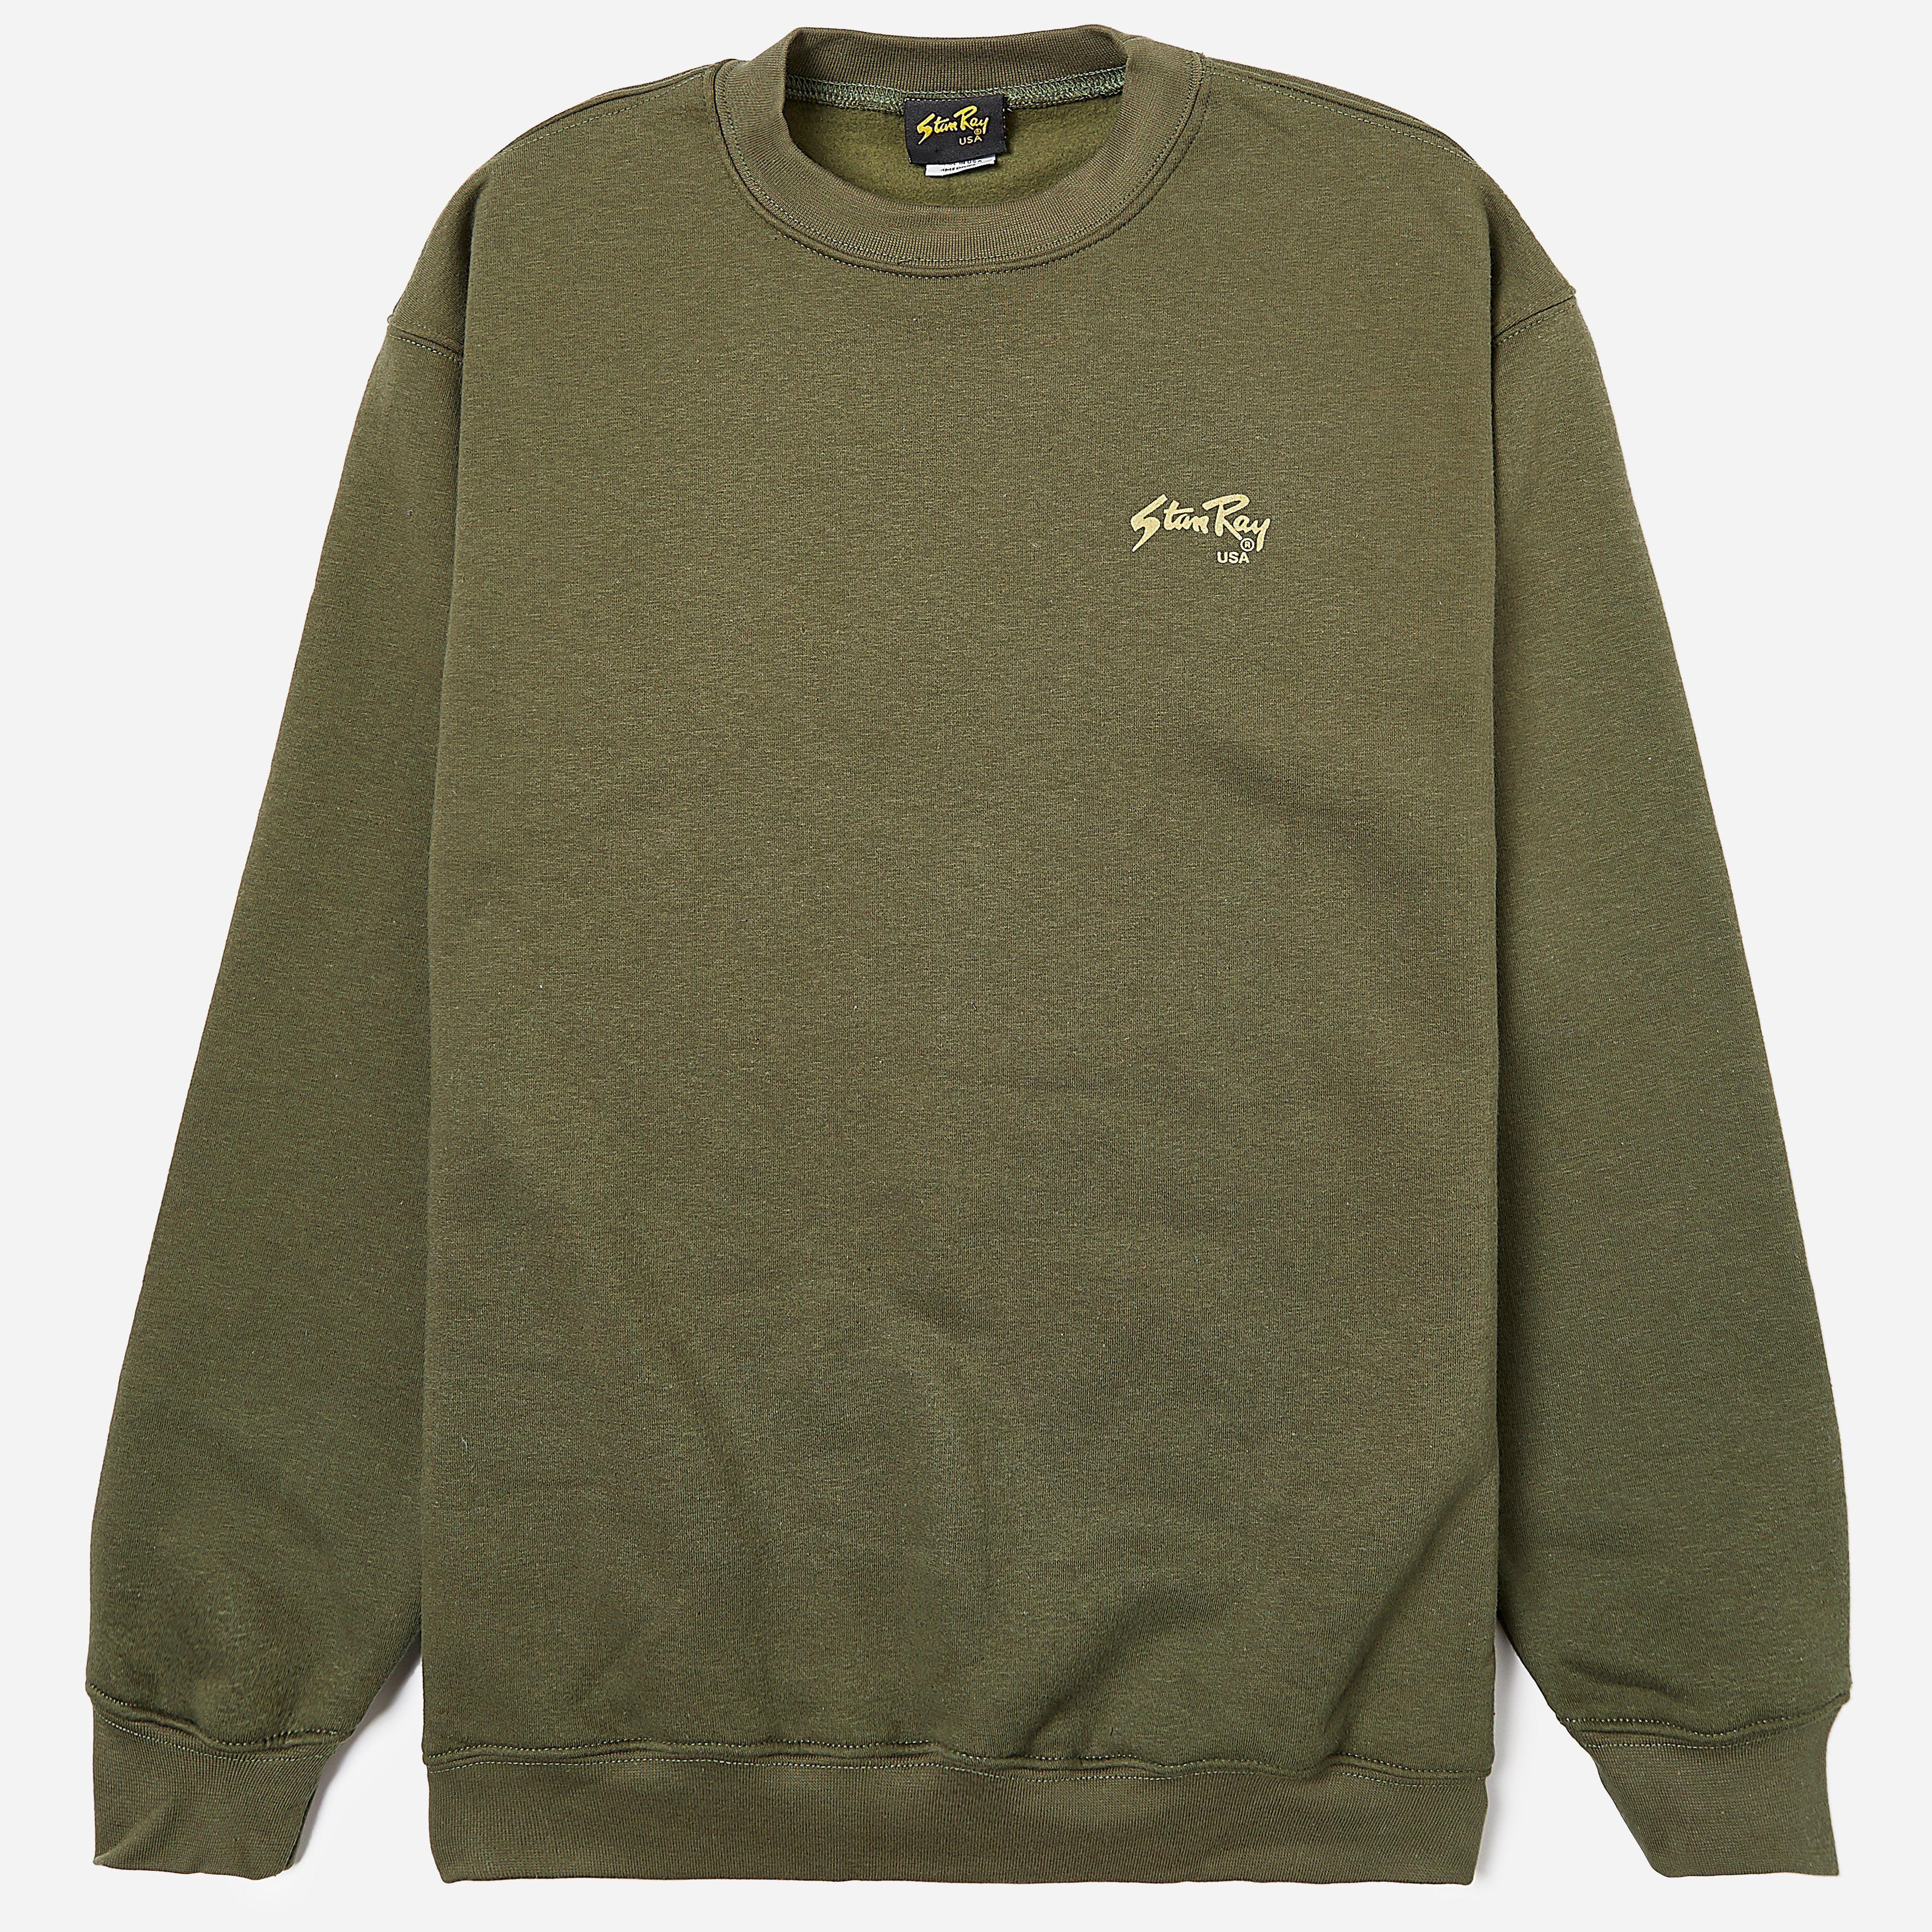 Stan Ray Stan Crew Sweatshirt